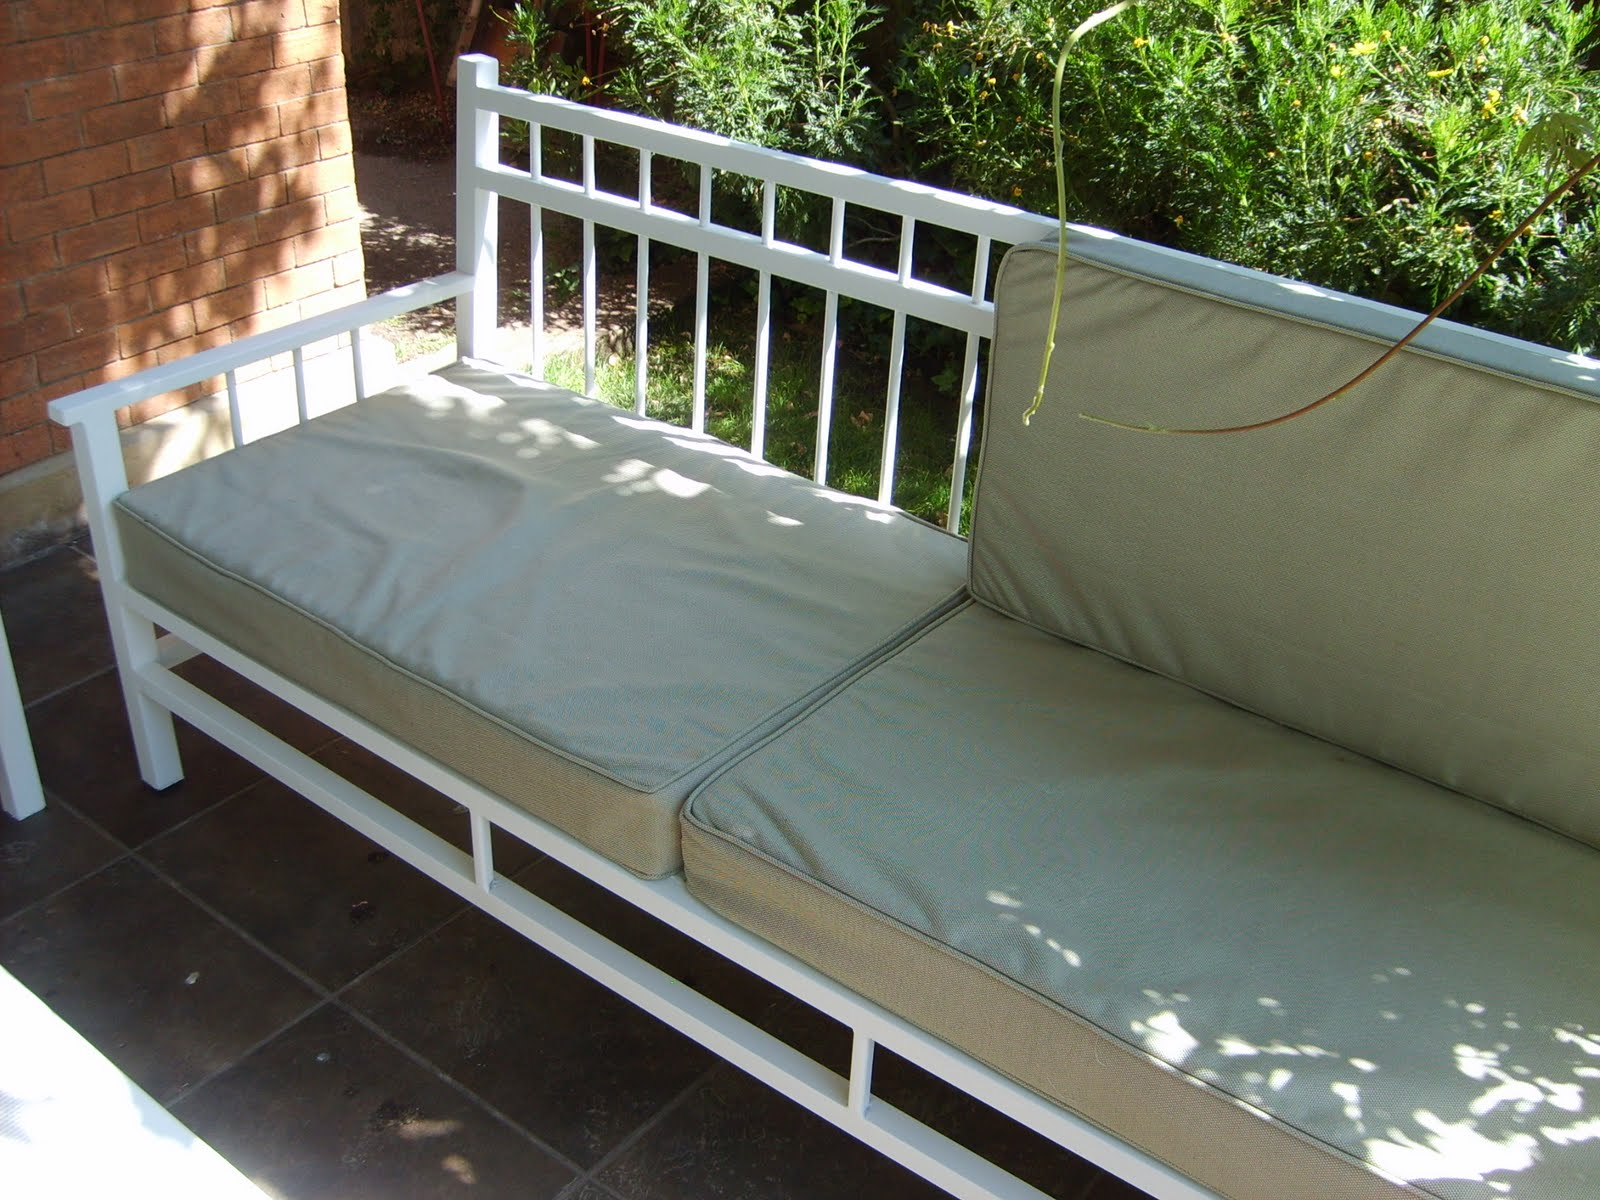 Son de fierro imagen for Amazon muebles terraza